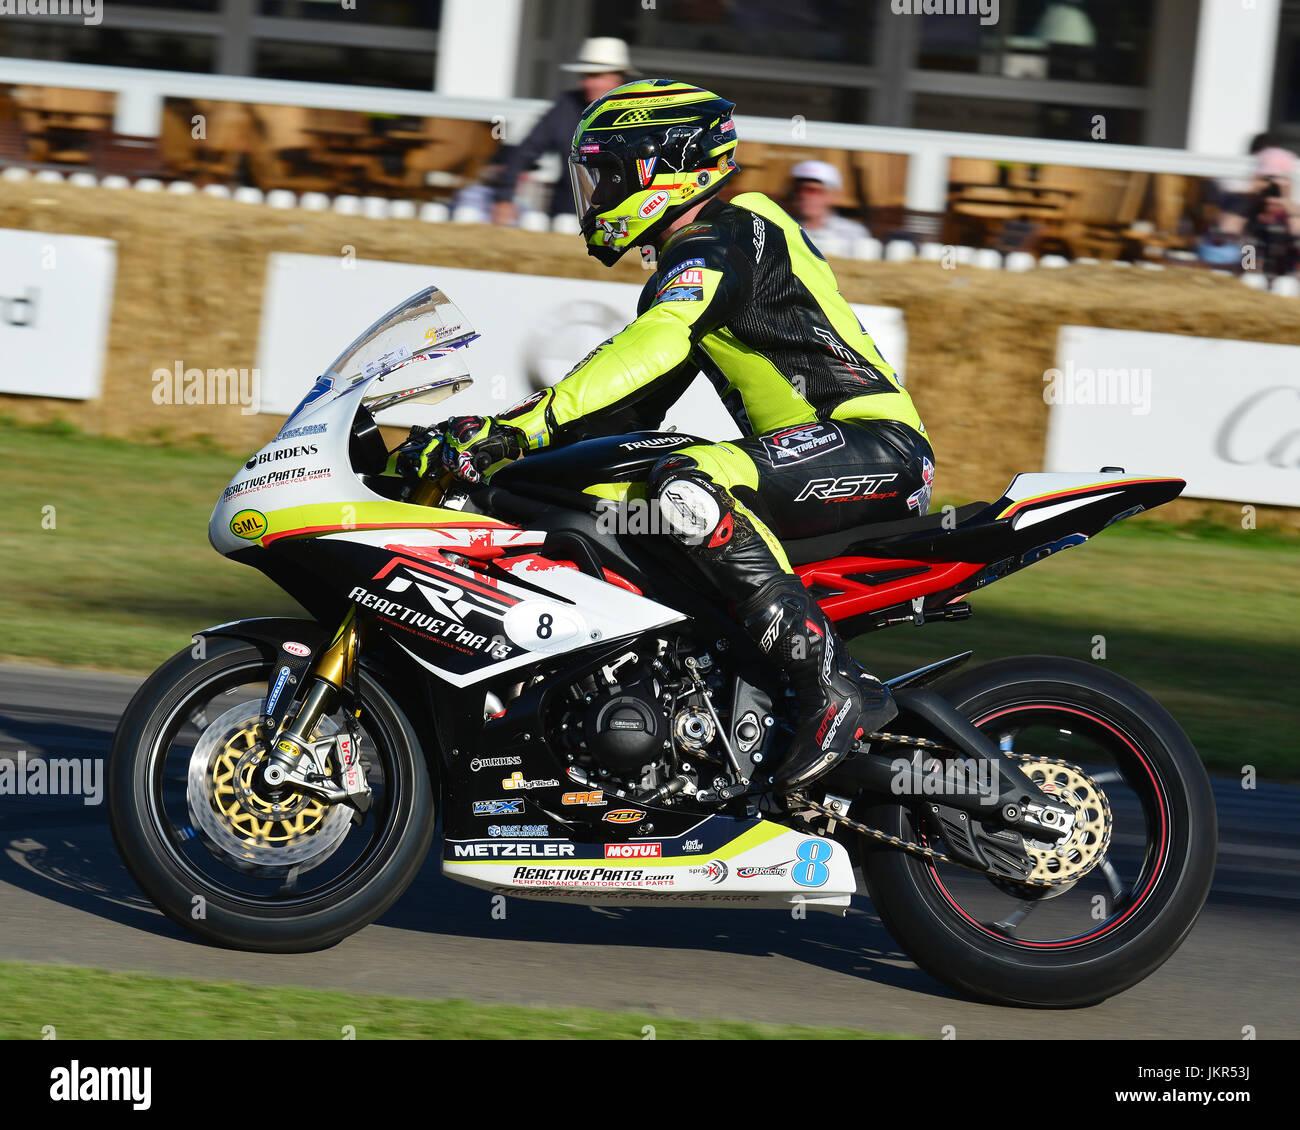 Gary Johnson Triumph Daytona 675 Goodwood Festival Of Speed 2017